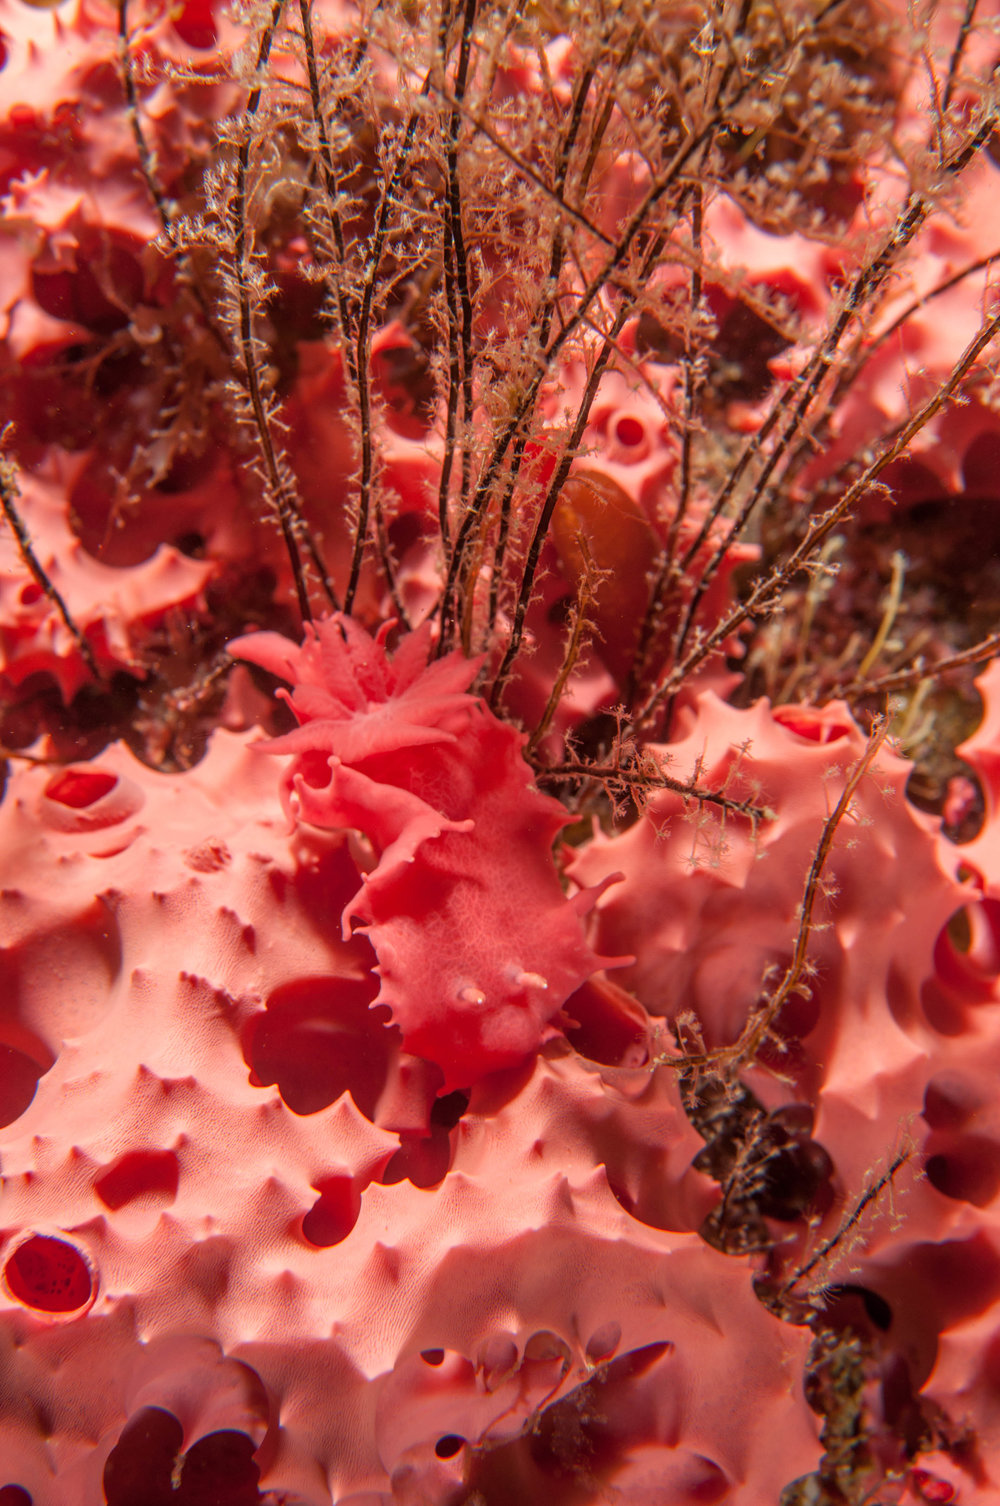 Verco's Verconis nudibranch (Verconia verconis)